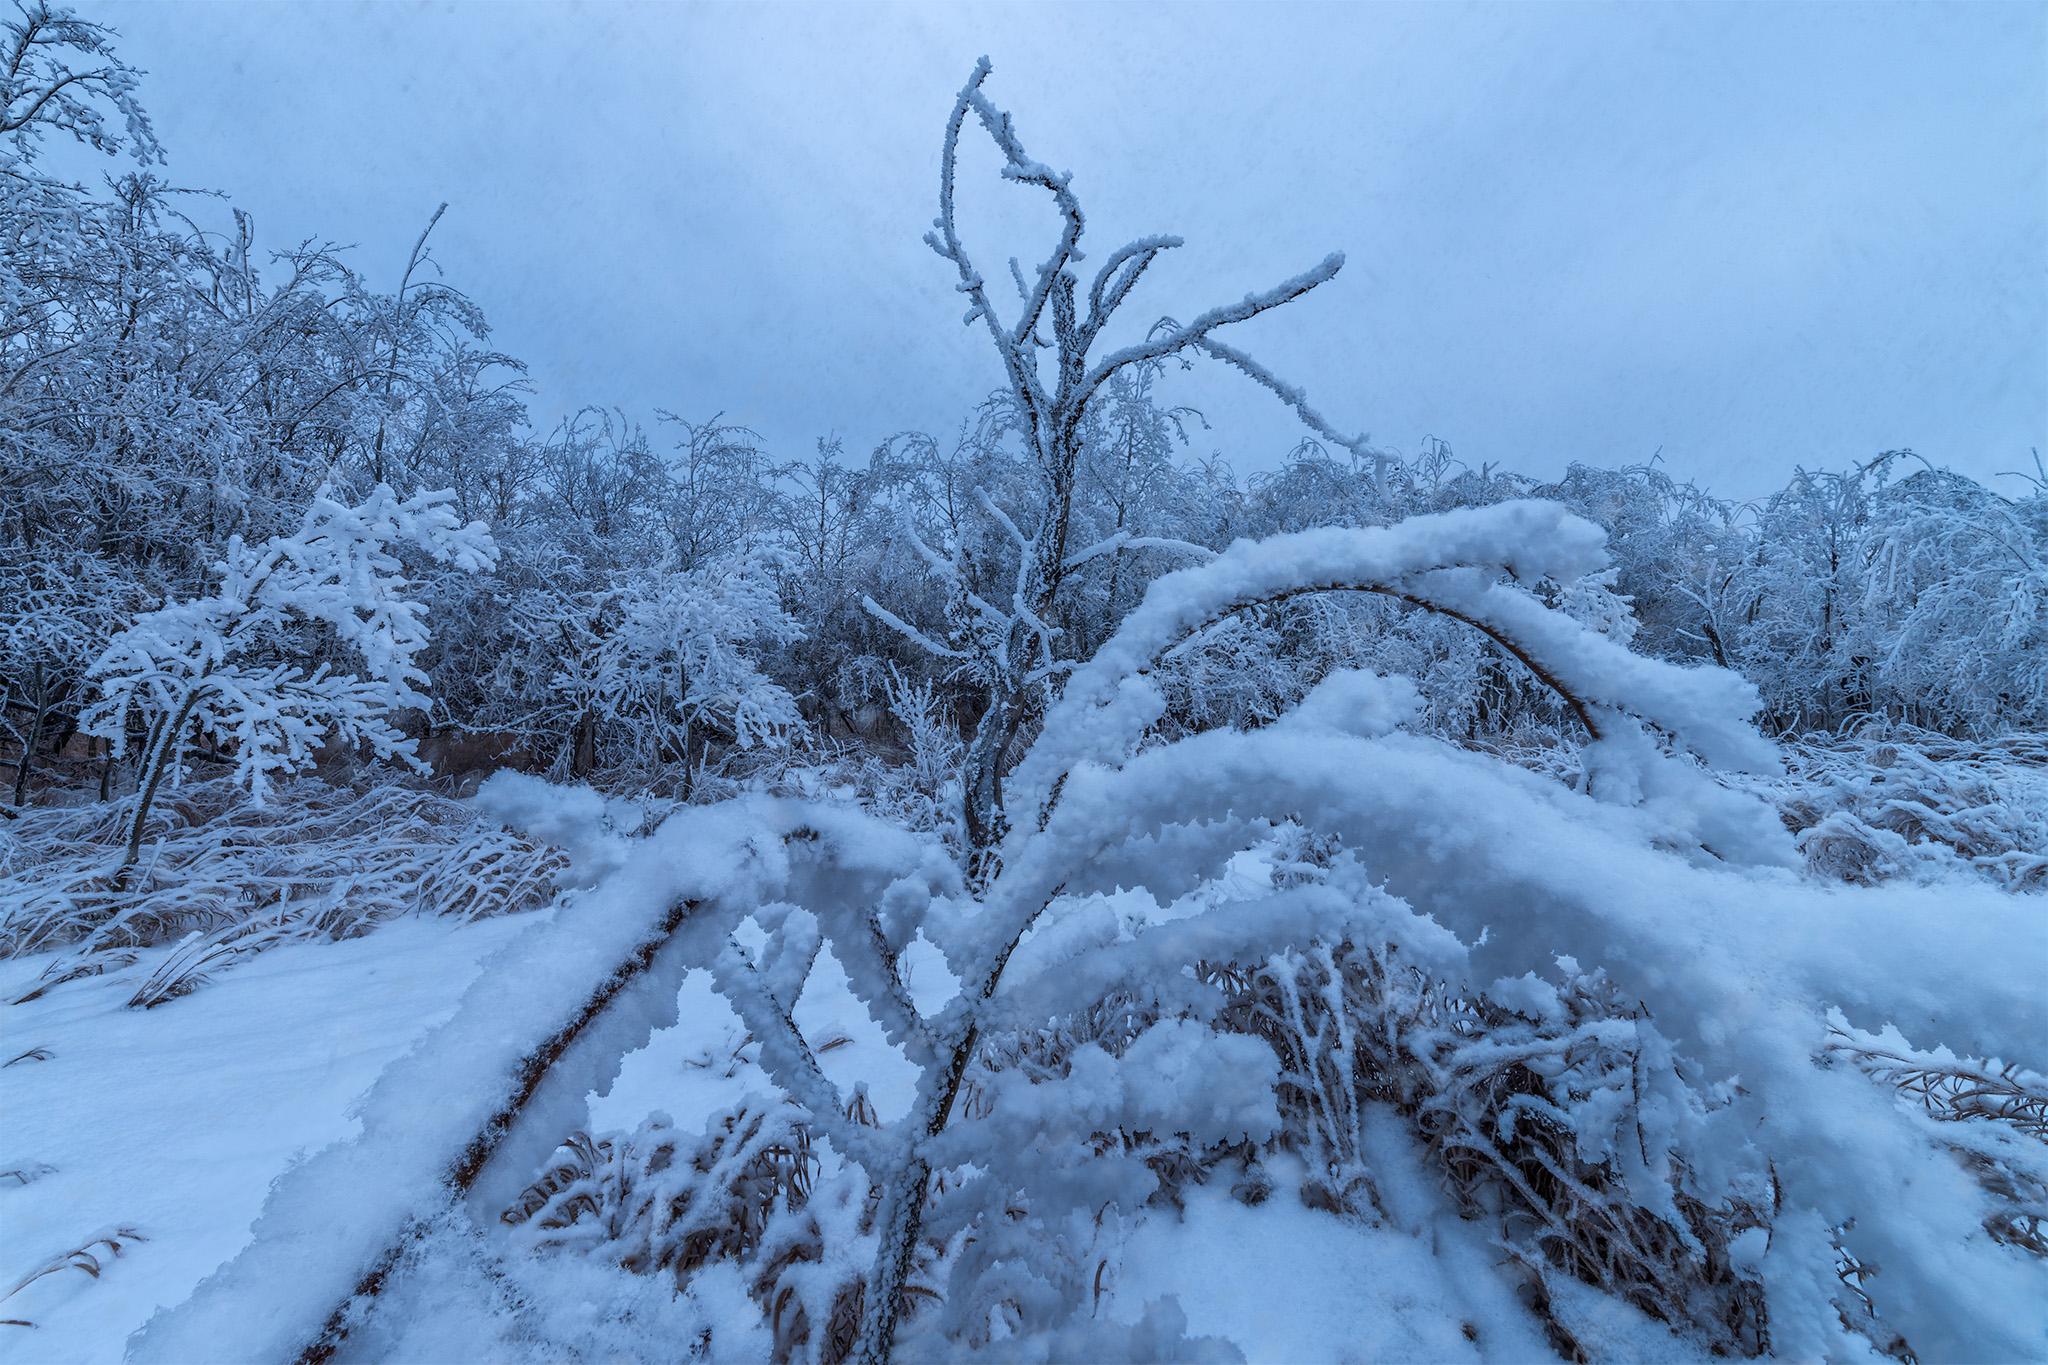 Landscape Photography in White Butte Trails Saskatchewan. Frozen trees under a layer of hoar frost